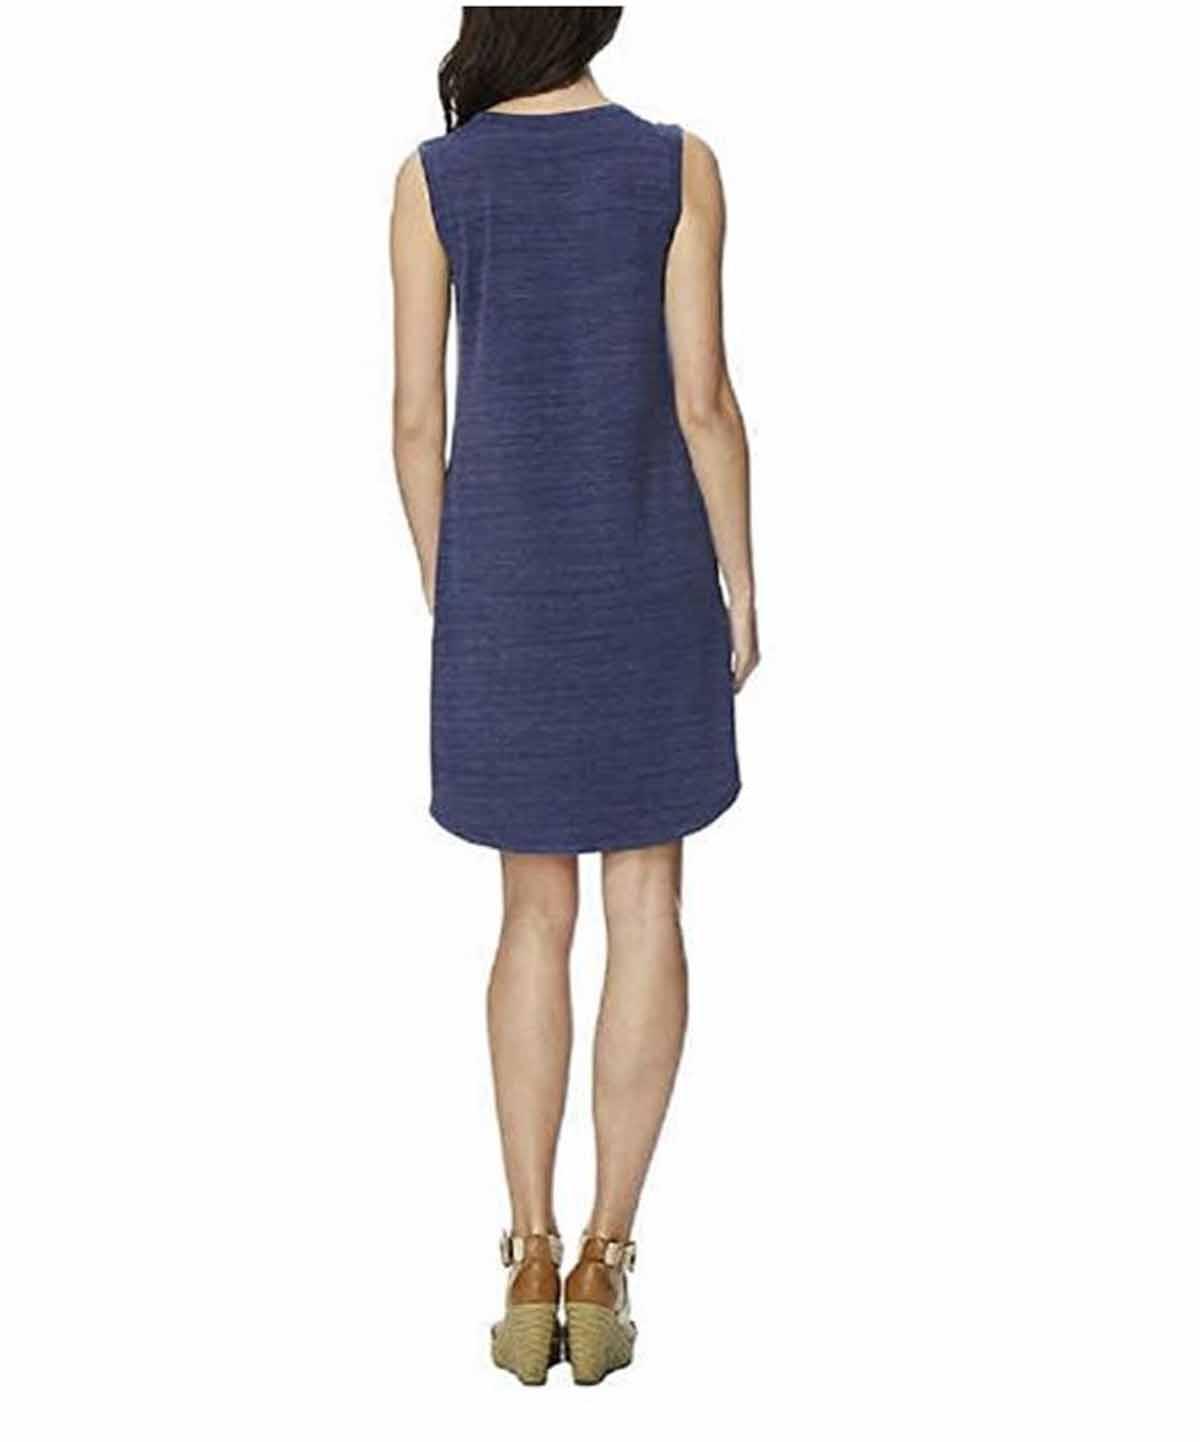 32 Degrees Womens Sleeveless Summer Dress